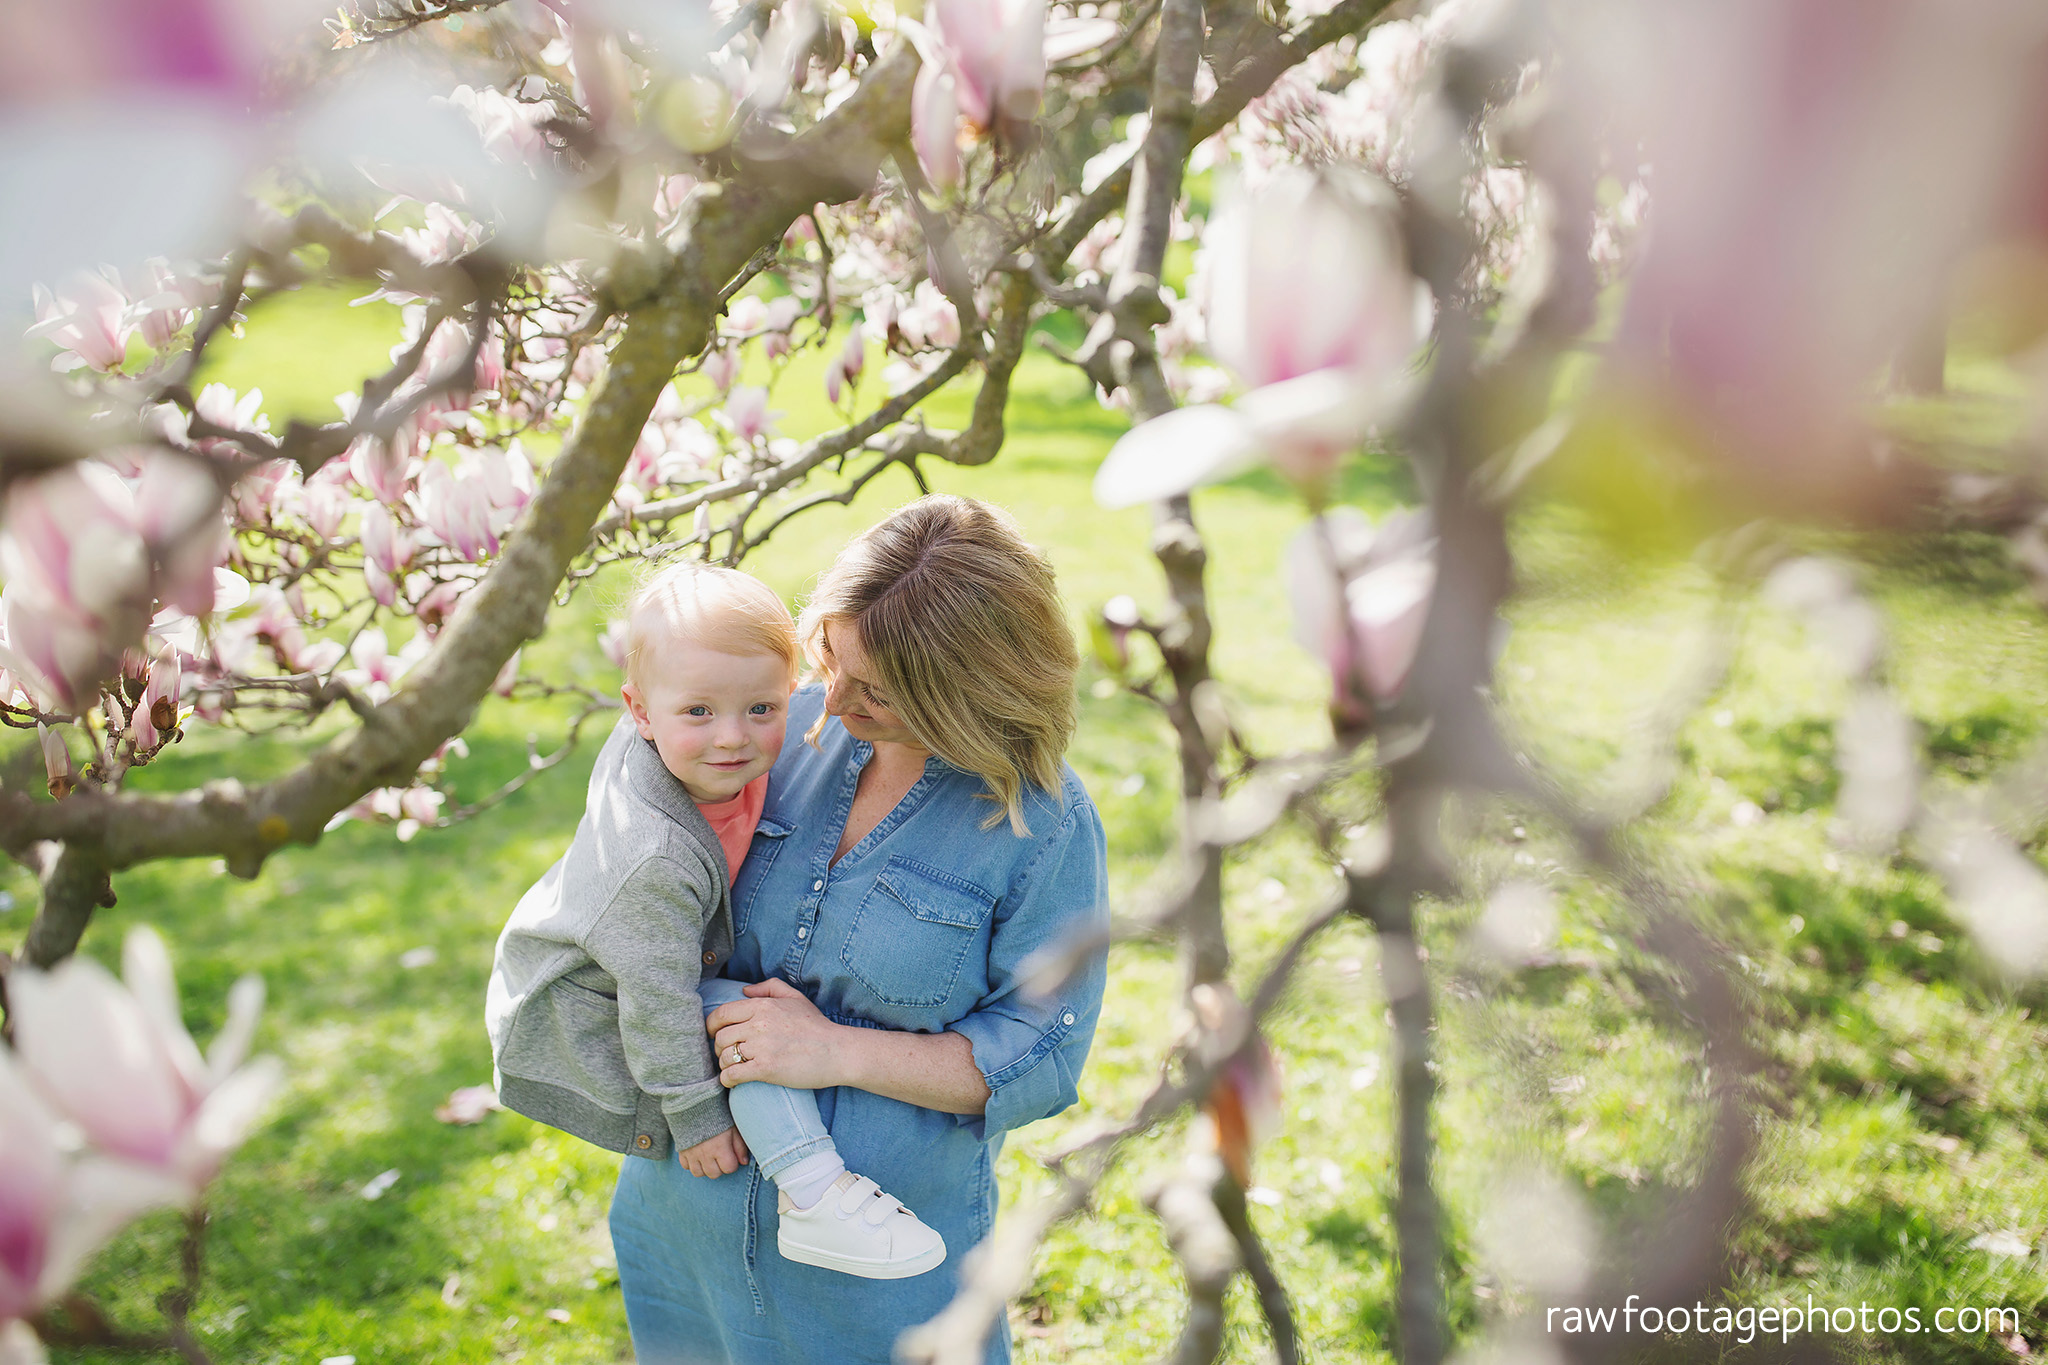 london_ontario_family_photographer-raw_footage_photography-spring_blossom_mini_sessions-magnolia-springbank_park010.jpg